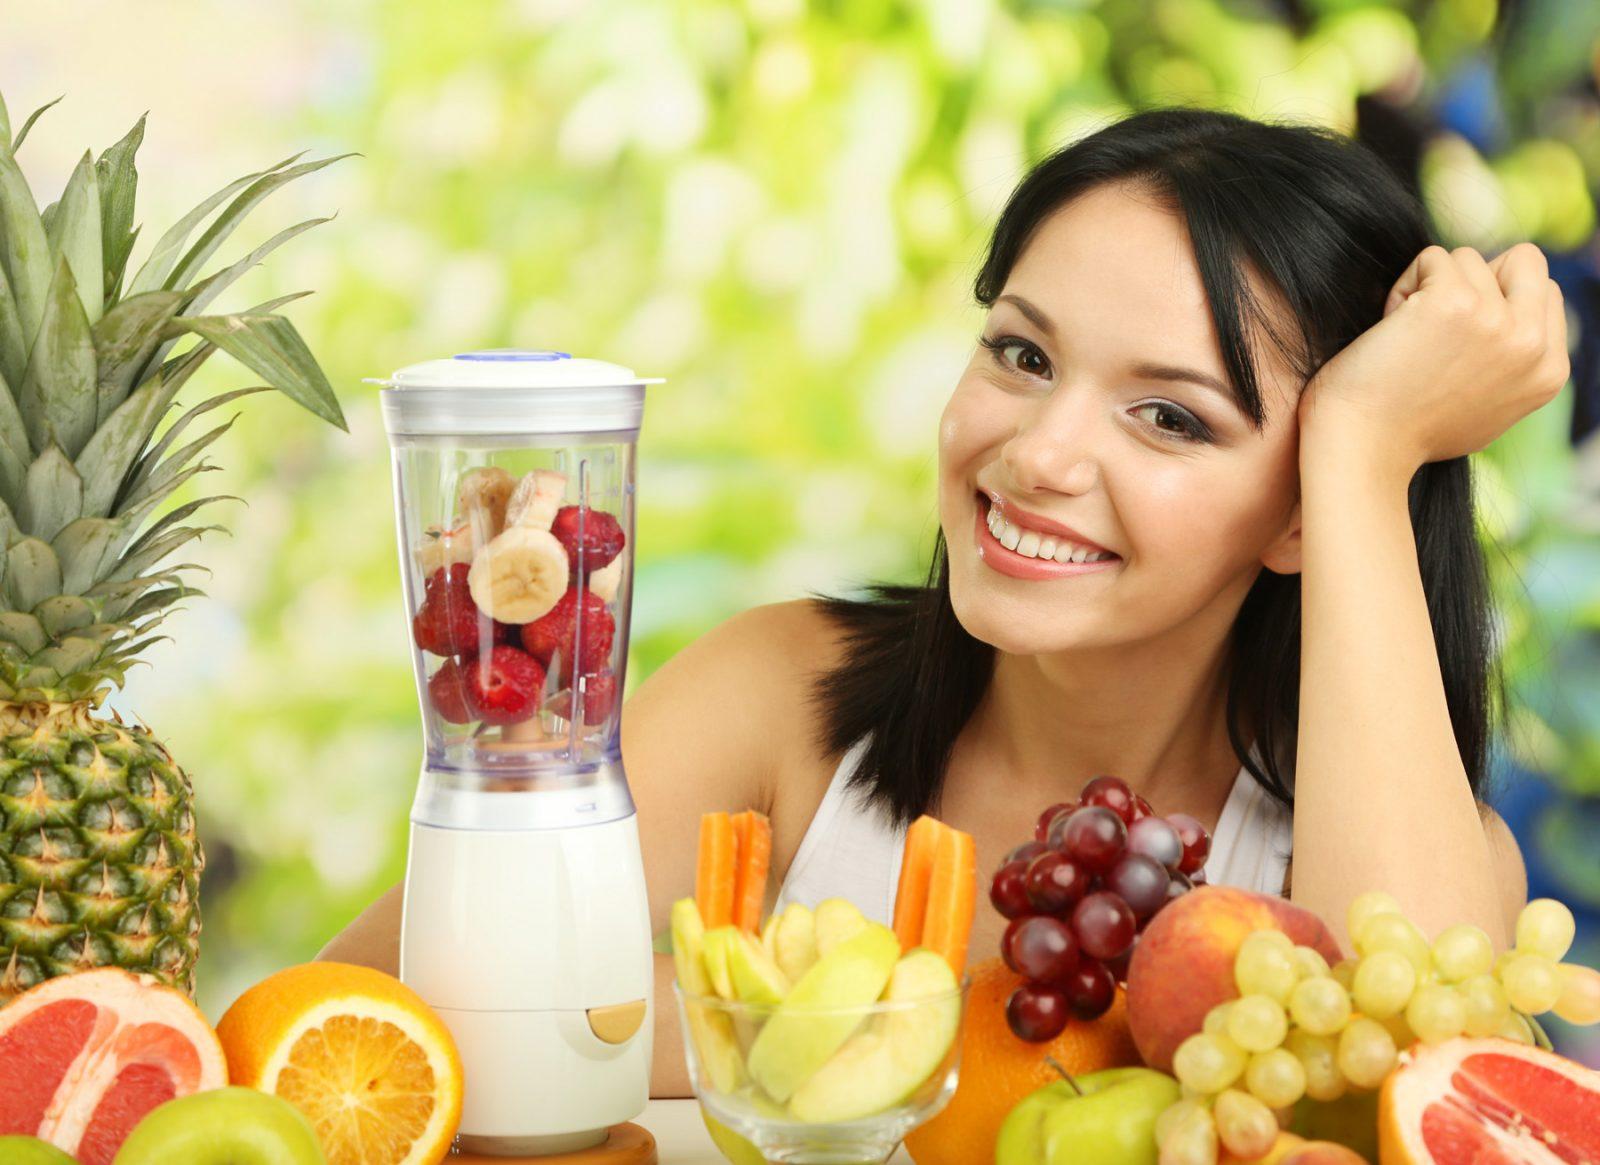 fruit-juicer-with-long-hair-beauties-1